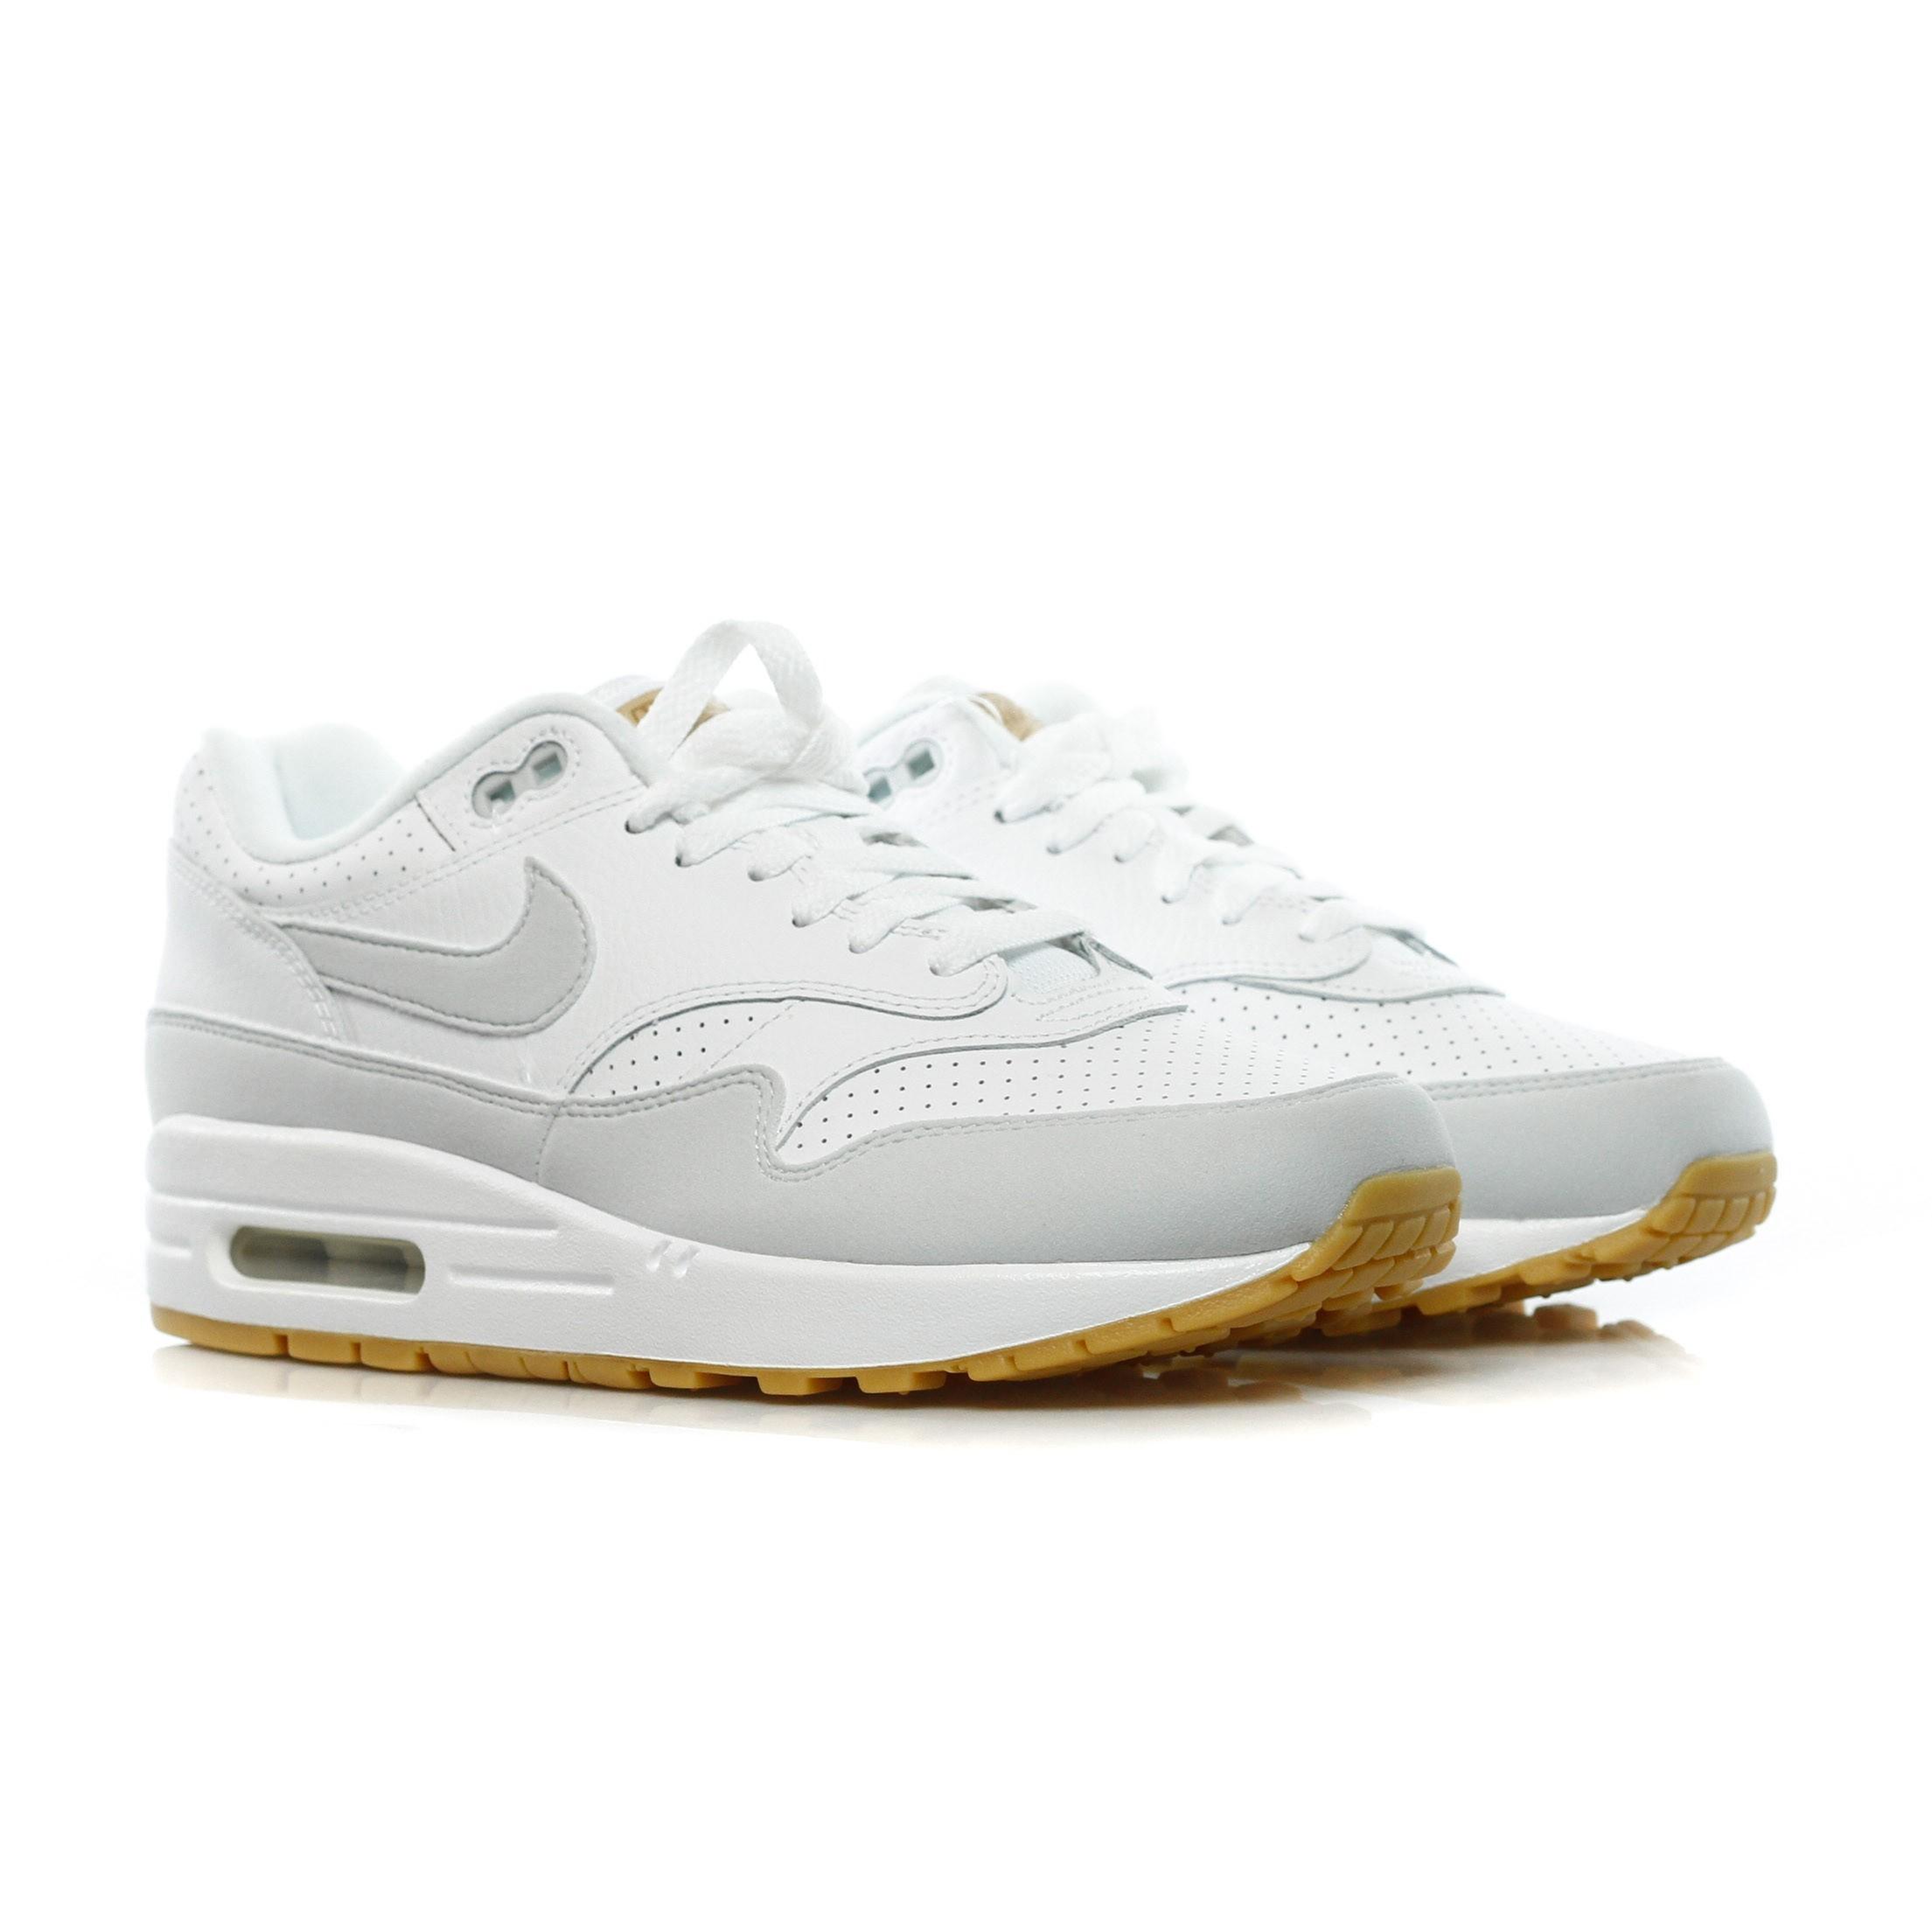 Nike Scarpa bassa uomo air max 1 AH8145-103   Atipicishop.com